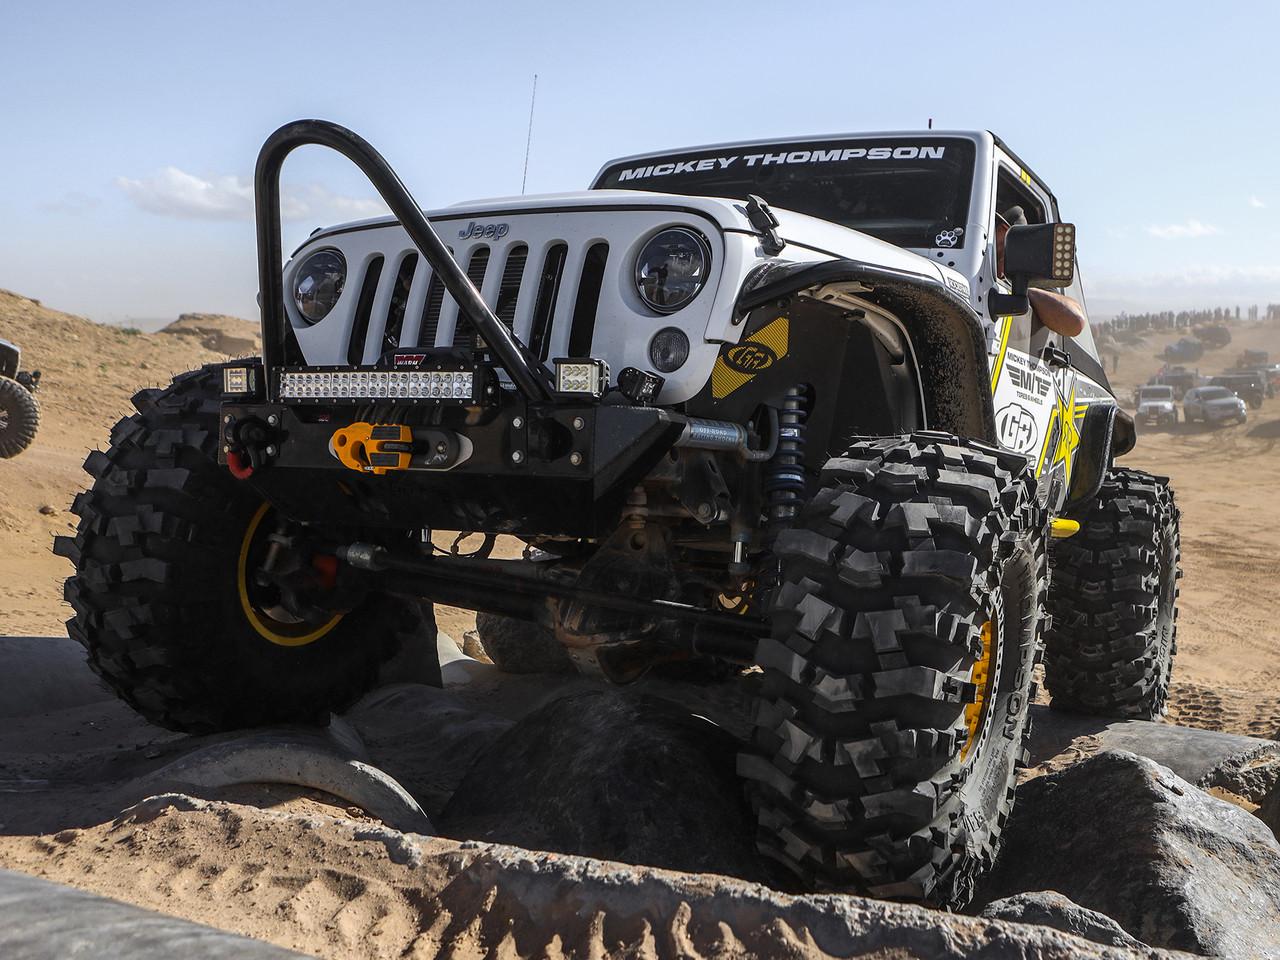 Jeep Mud Tires >> Mickey Thompson Baja Pro X Extreme Mud Terrain Tire Genright Off